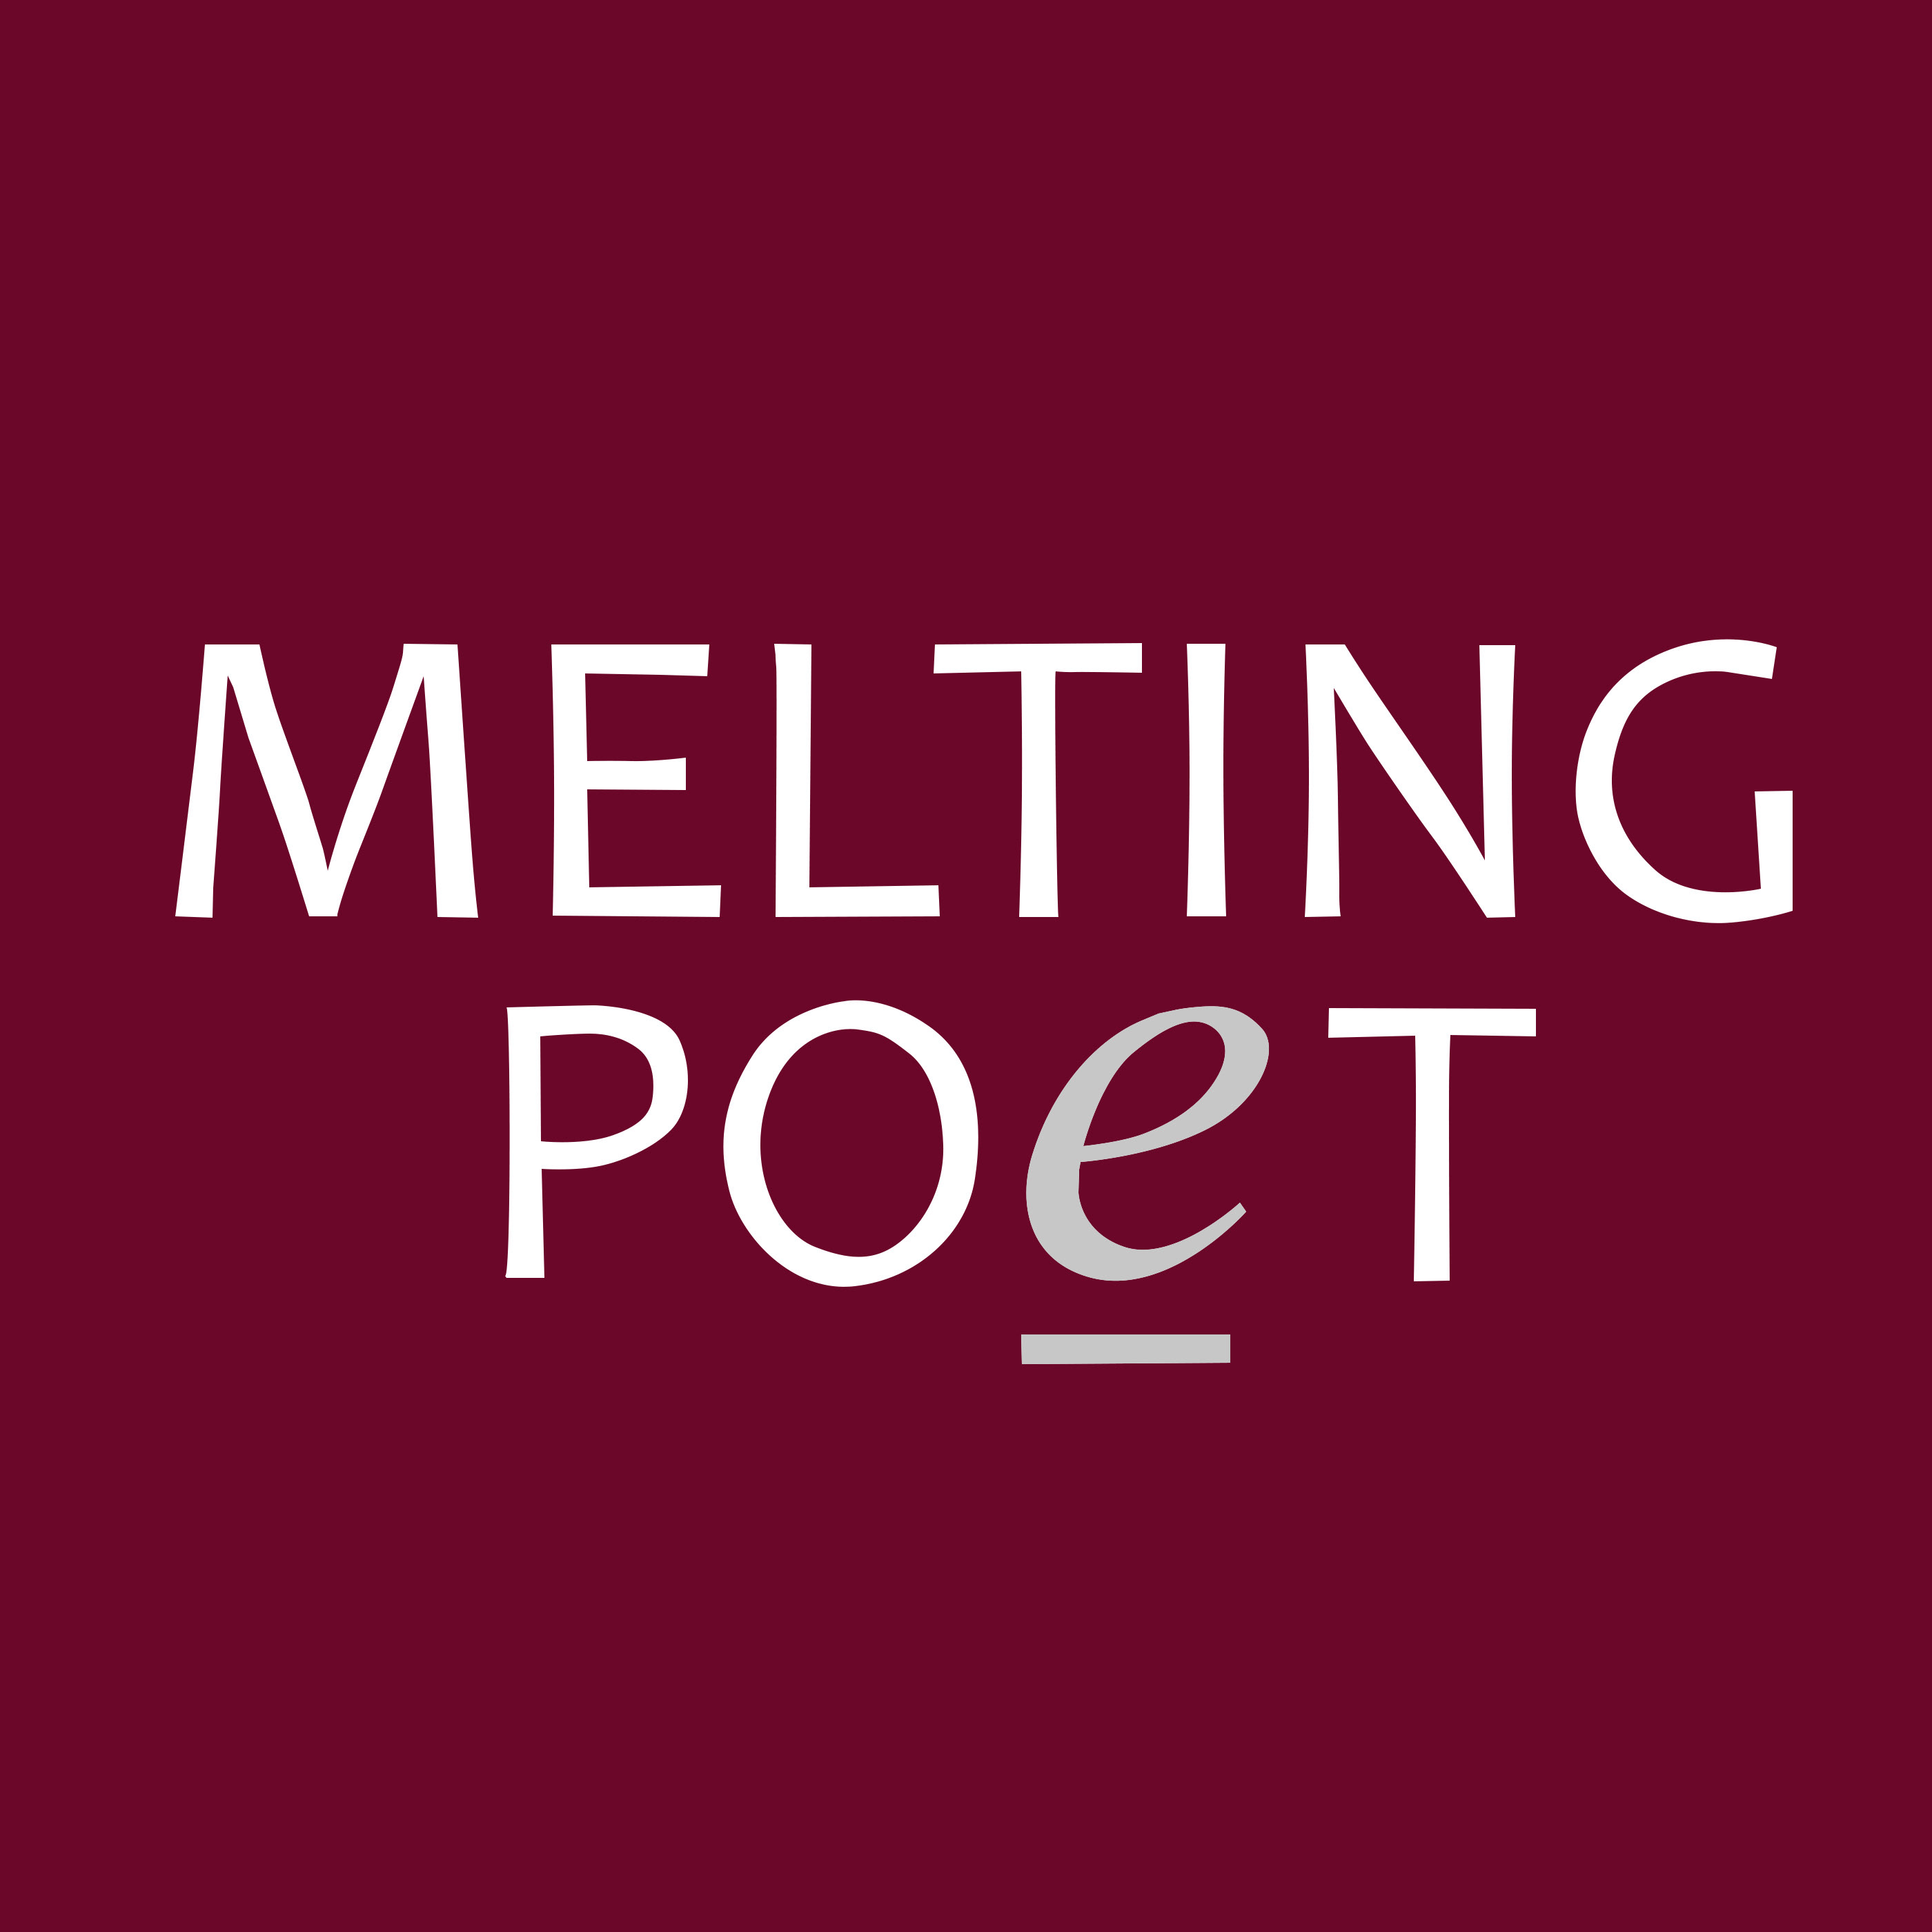 meltingpoet